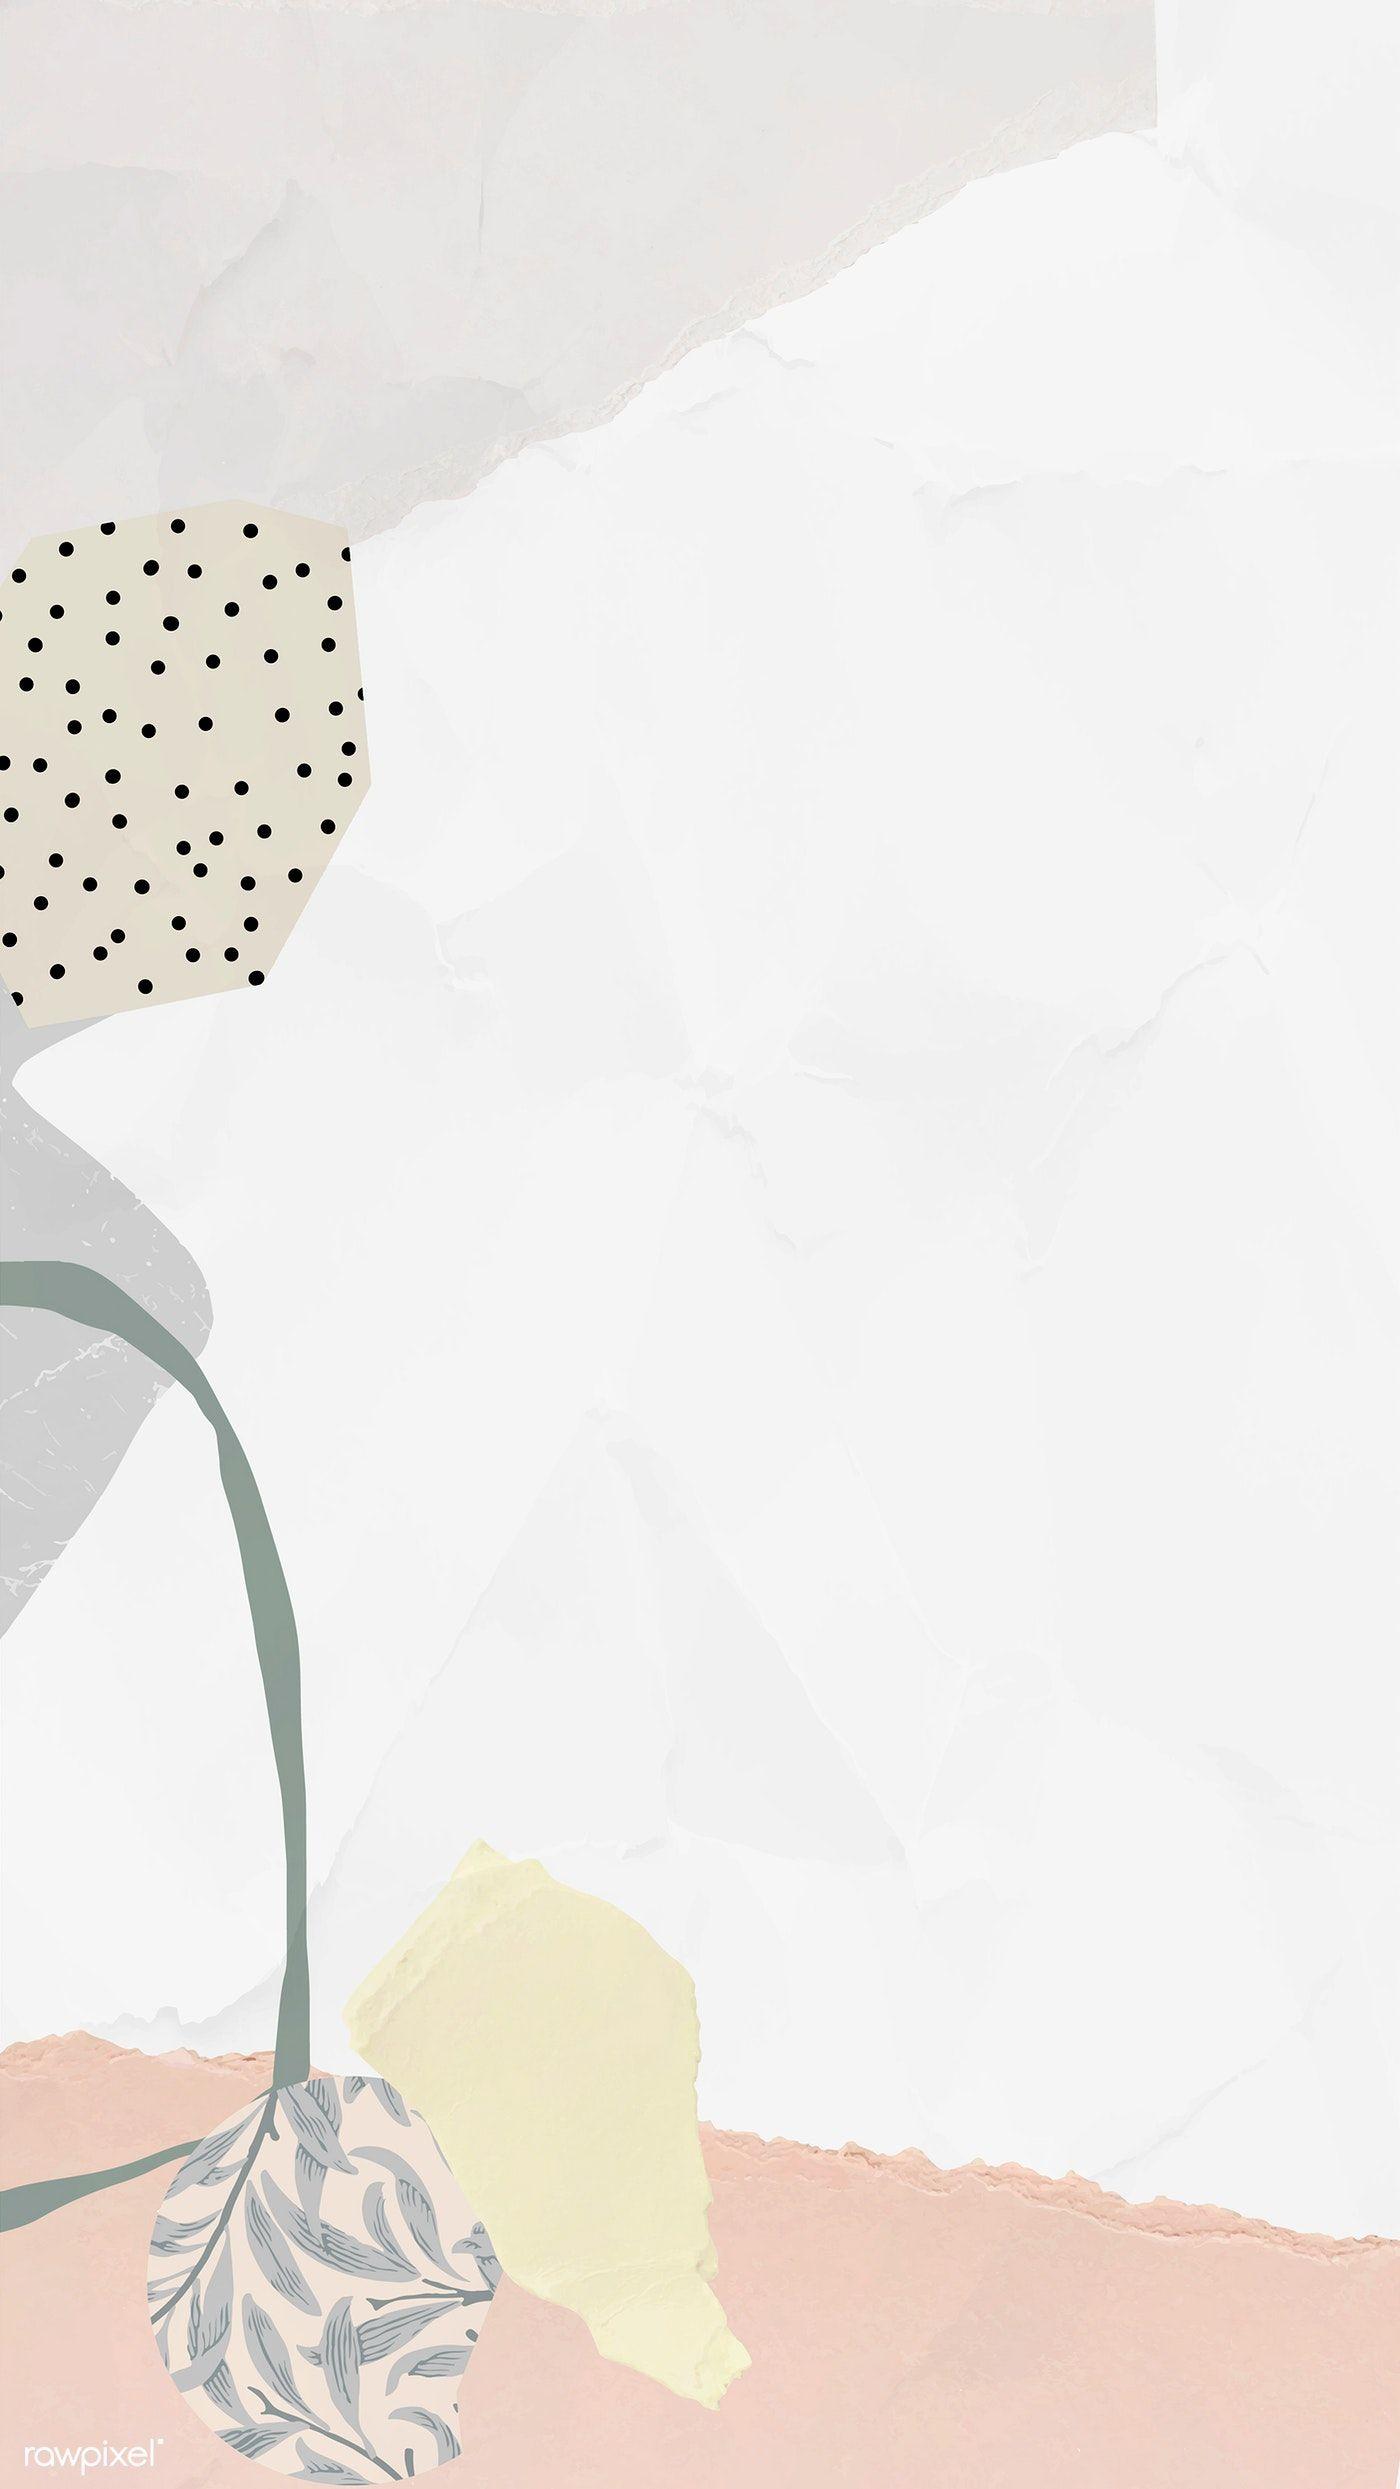 Download premium vector of White frame mobile phone wallpaper vector